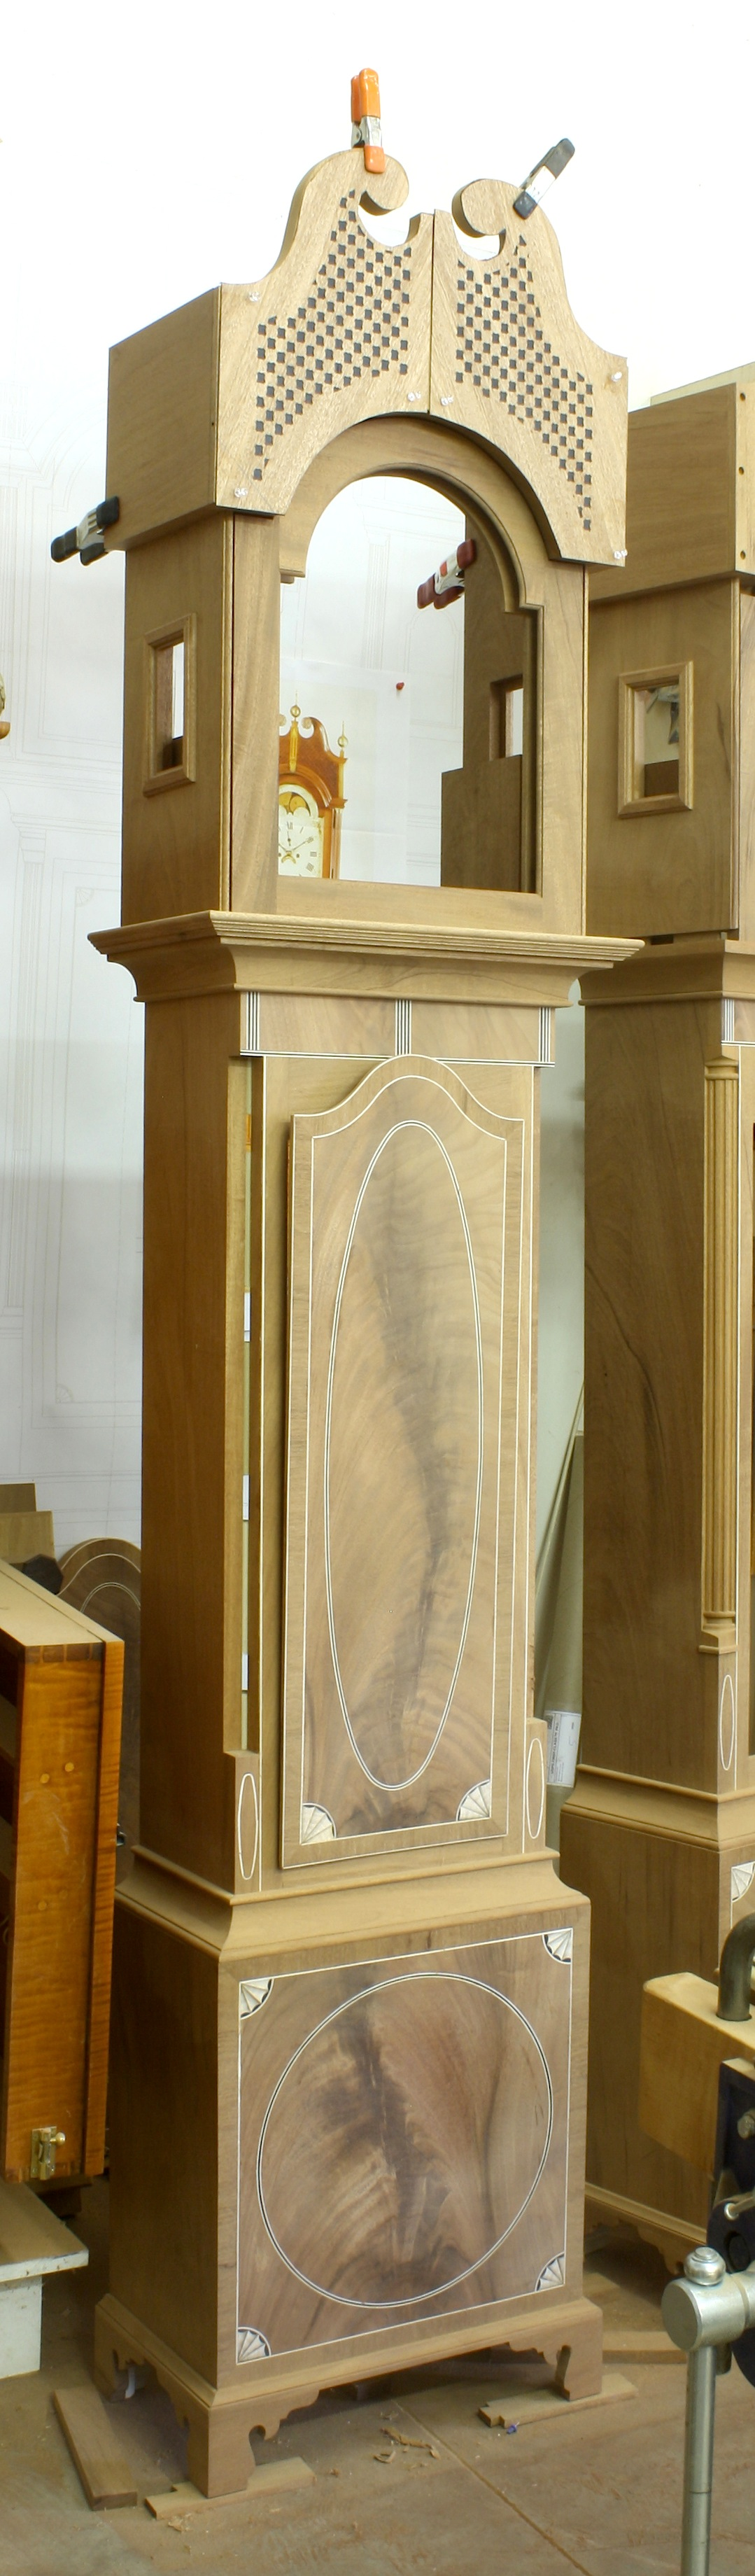 Fine Woodworking Clock Plans Woodworking Plans Desk Chair